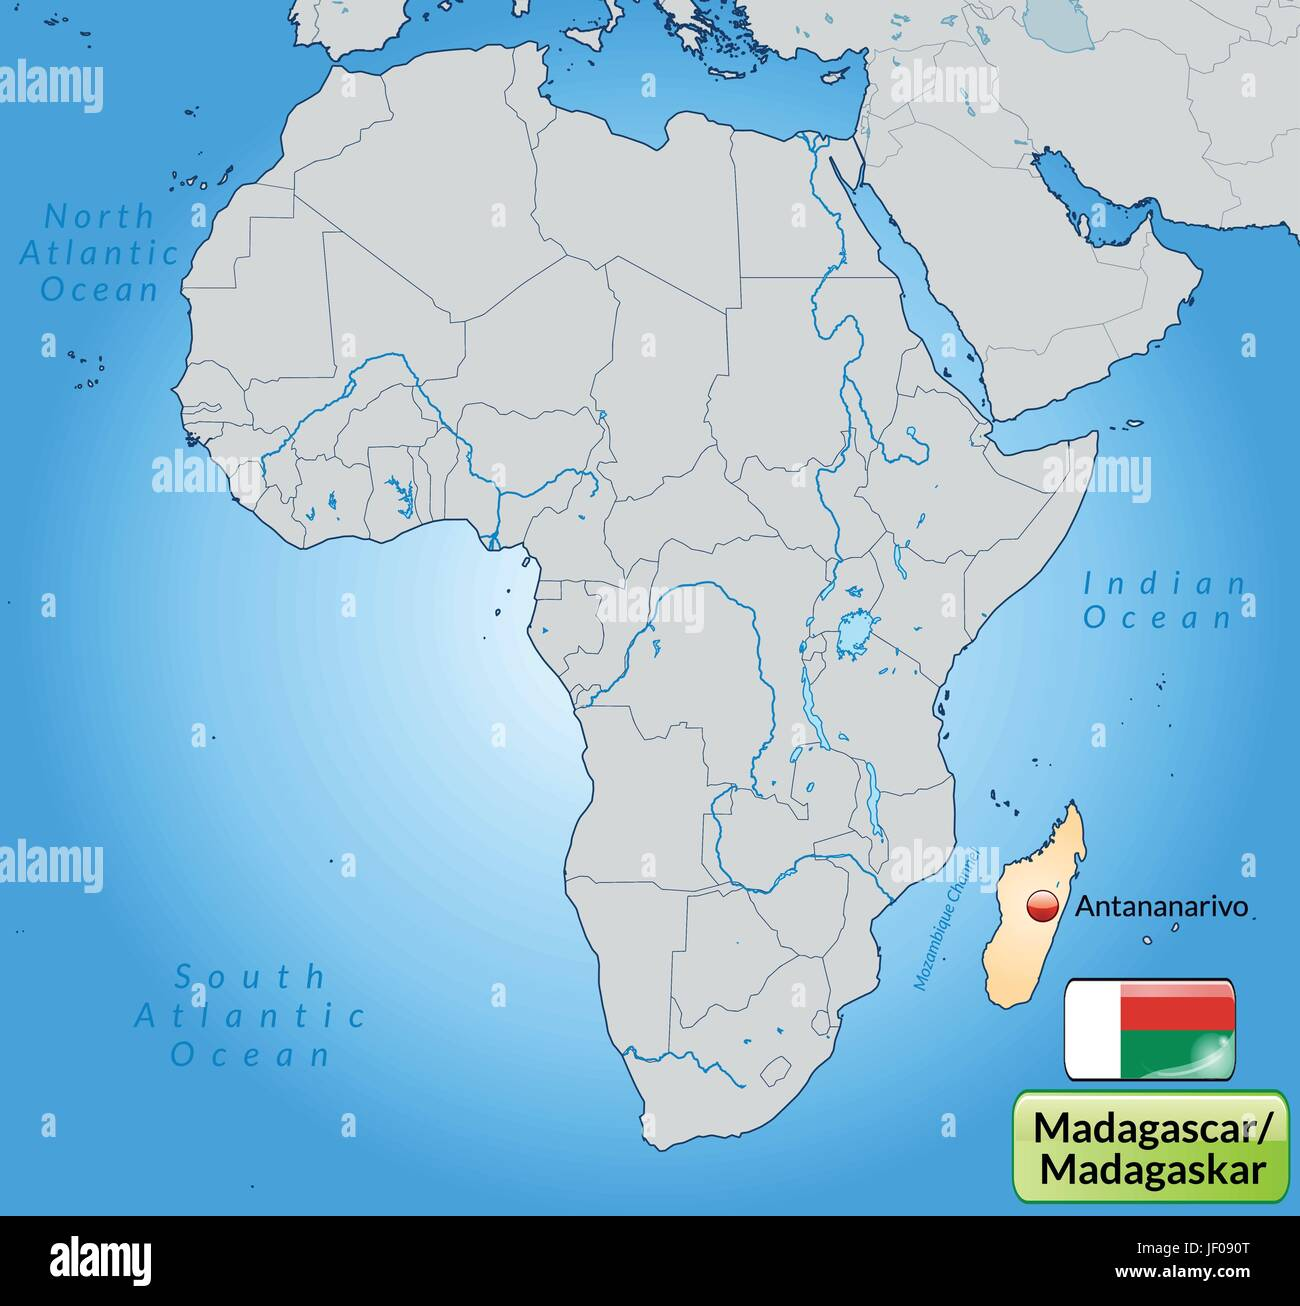 Toliara Madagascar Stock Vector Images - Alamy